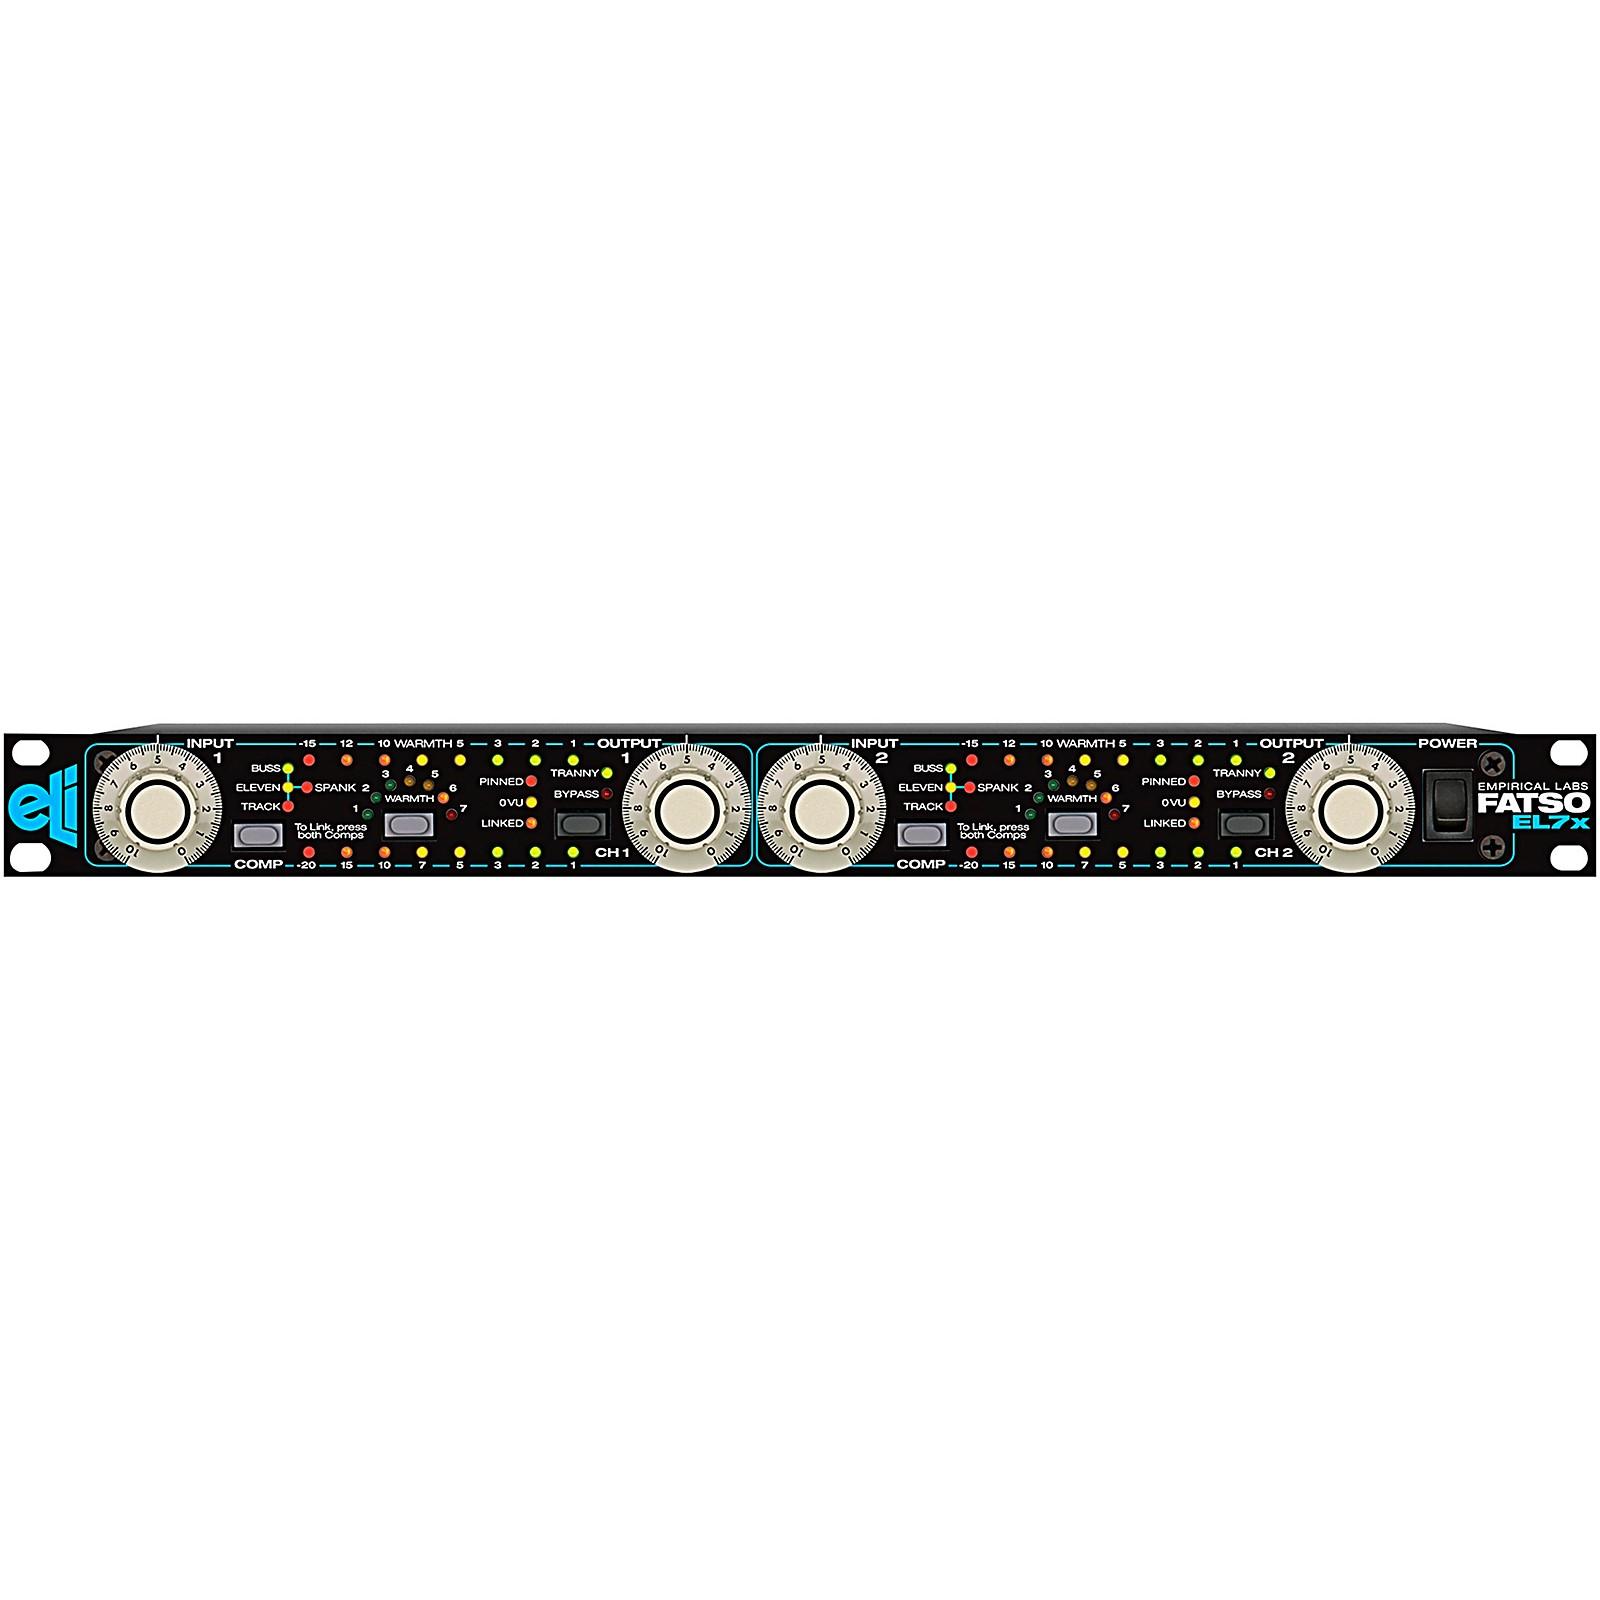 Empirical Labs EL7 Fatso Analog Tape Simulator and Optimizer